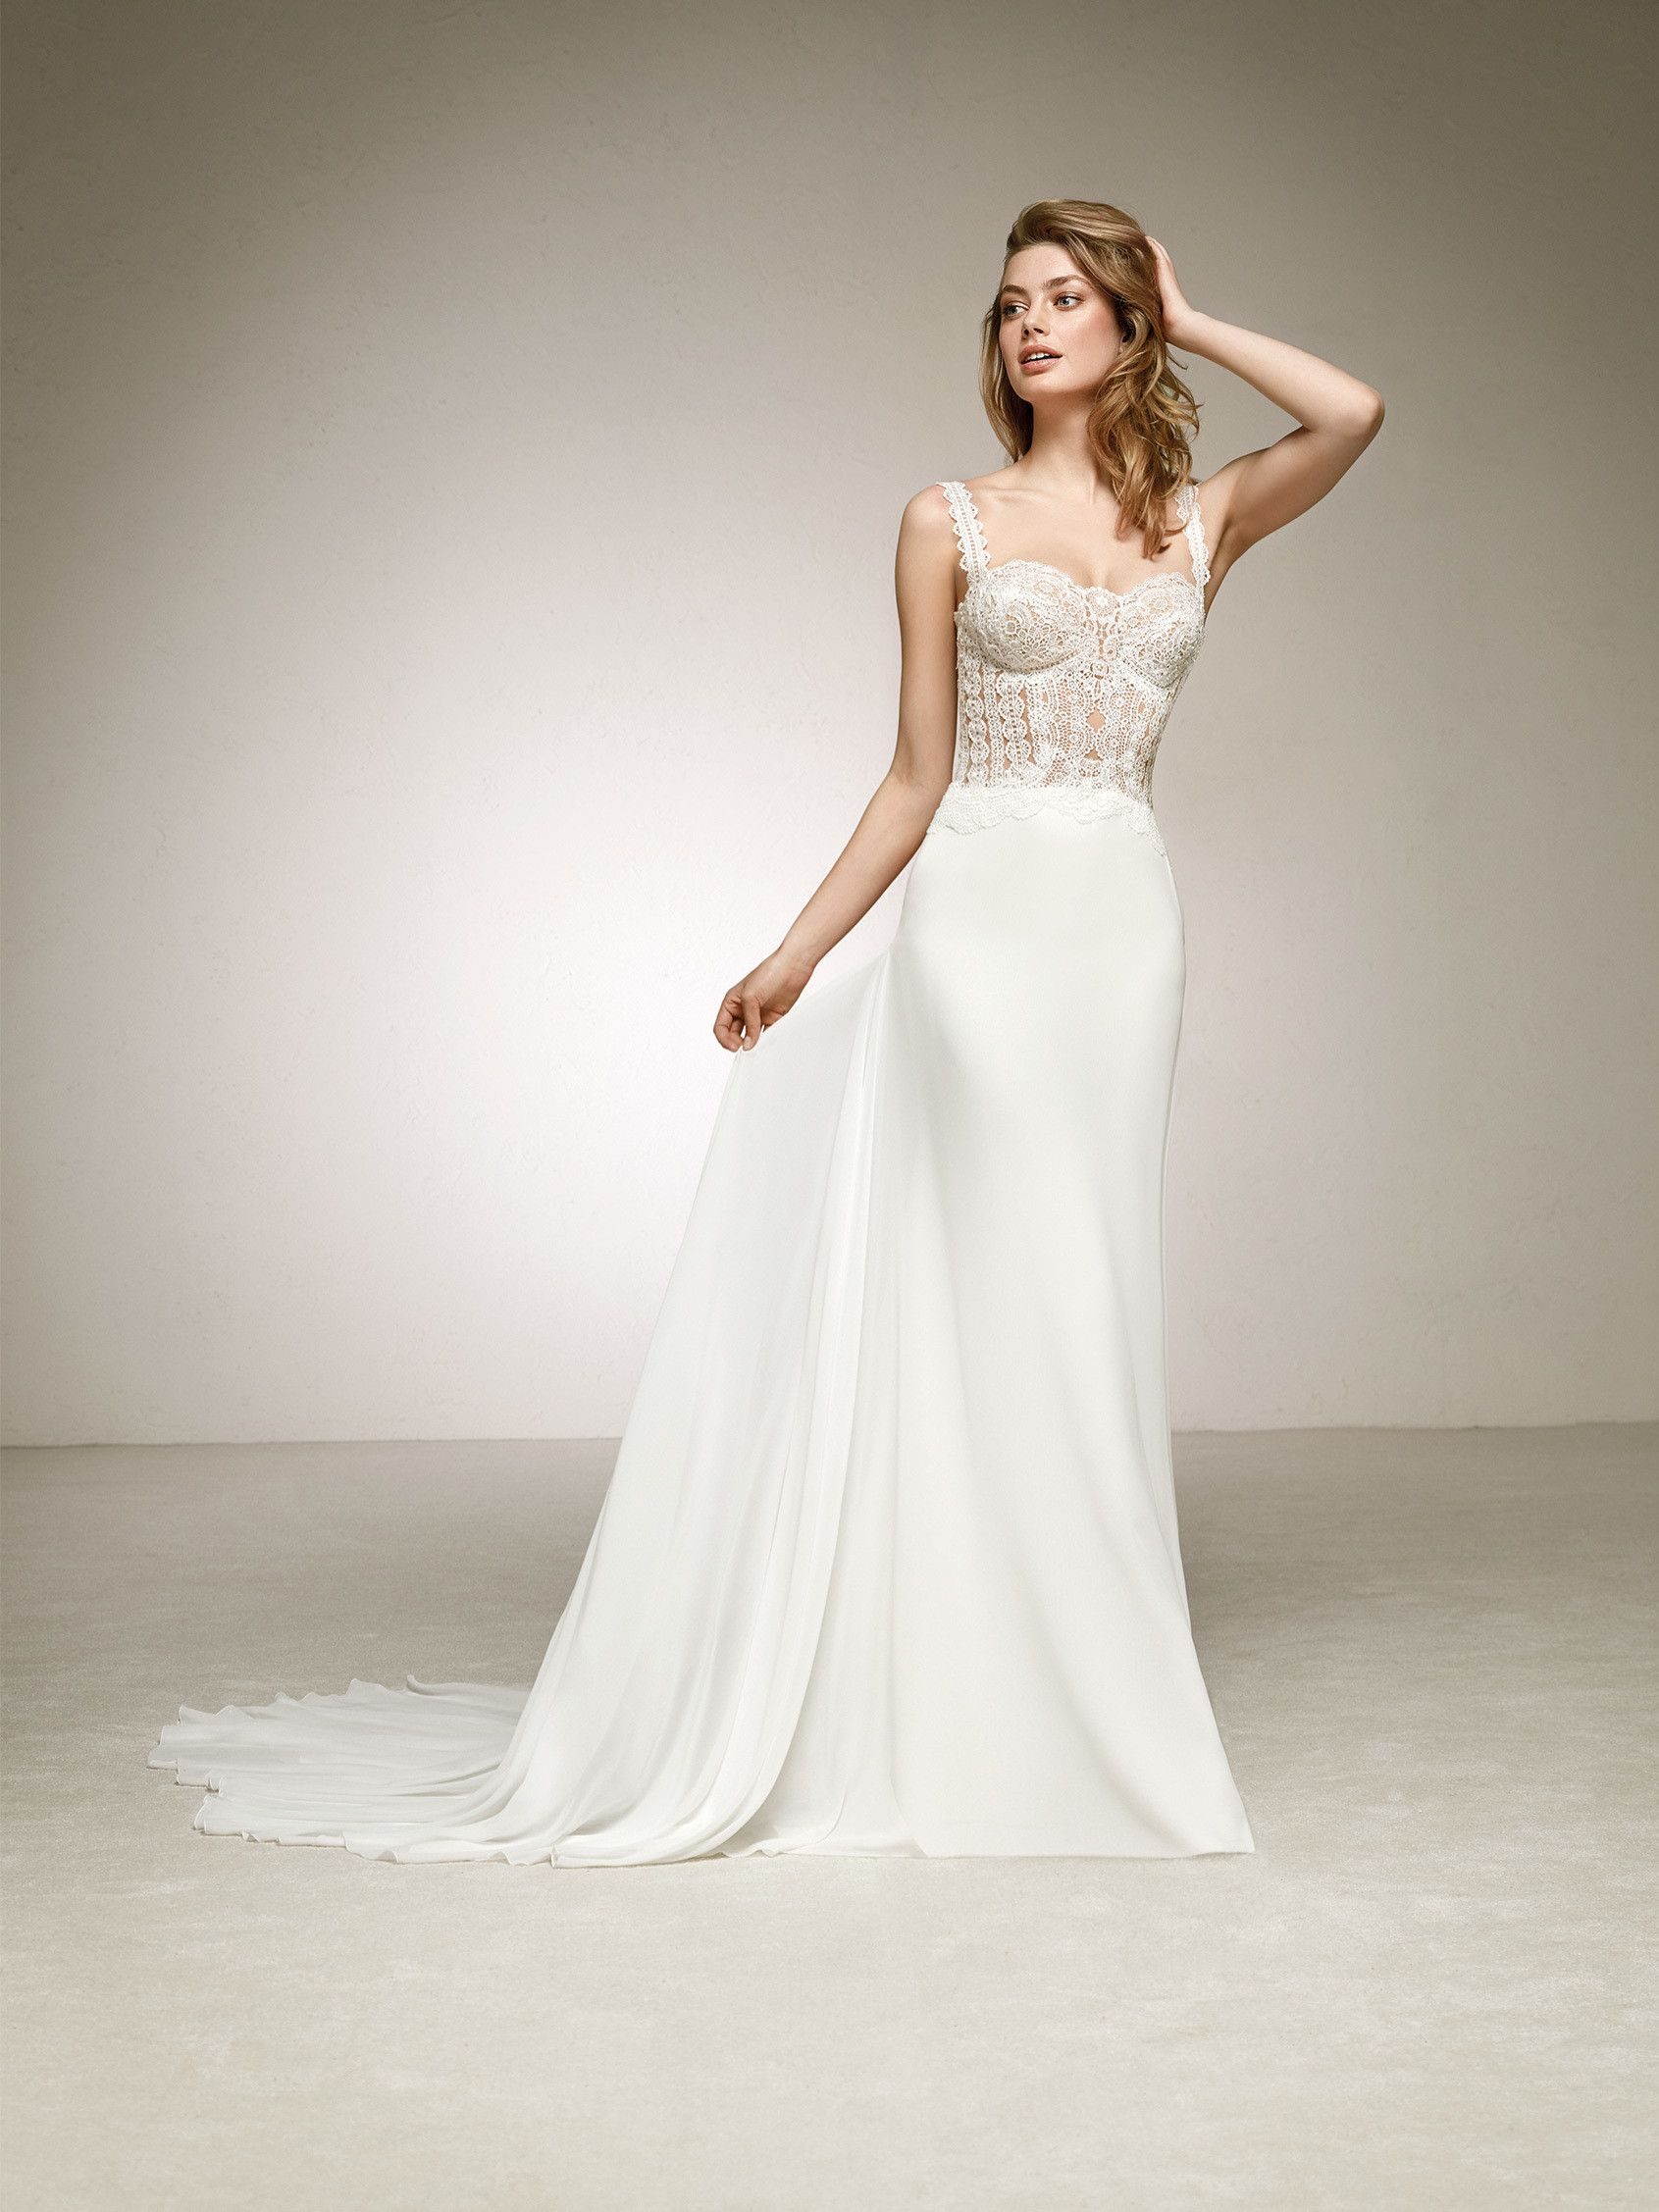 Vestido de novia boda sencillo